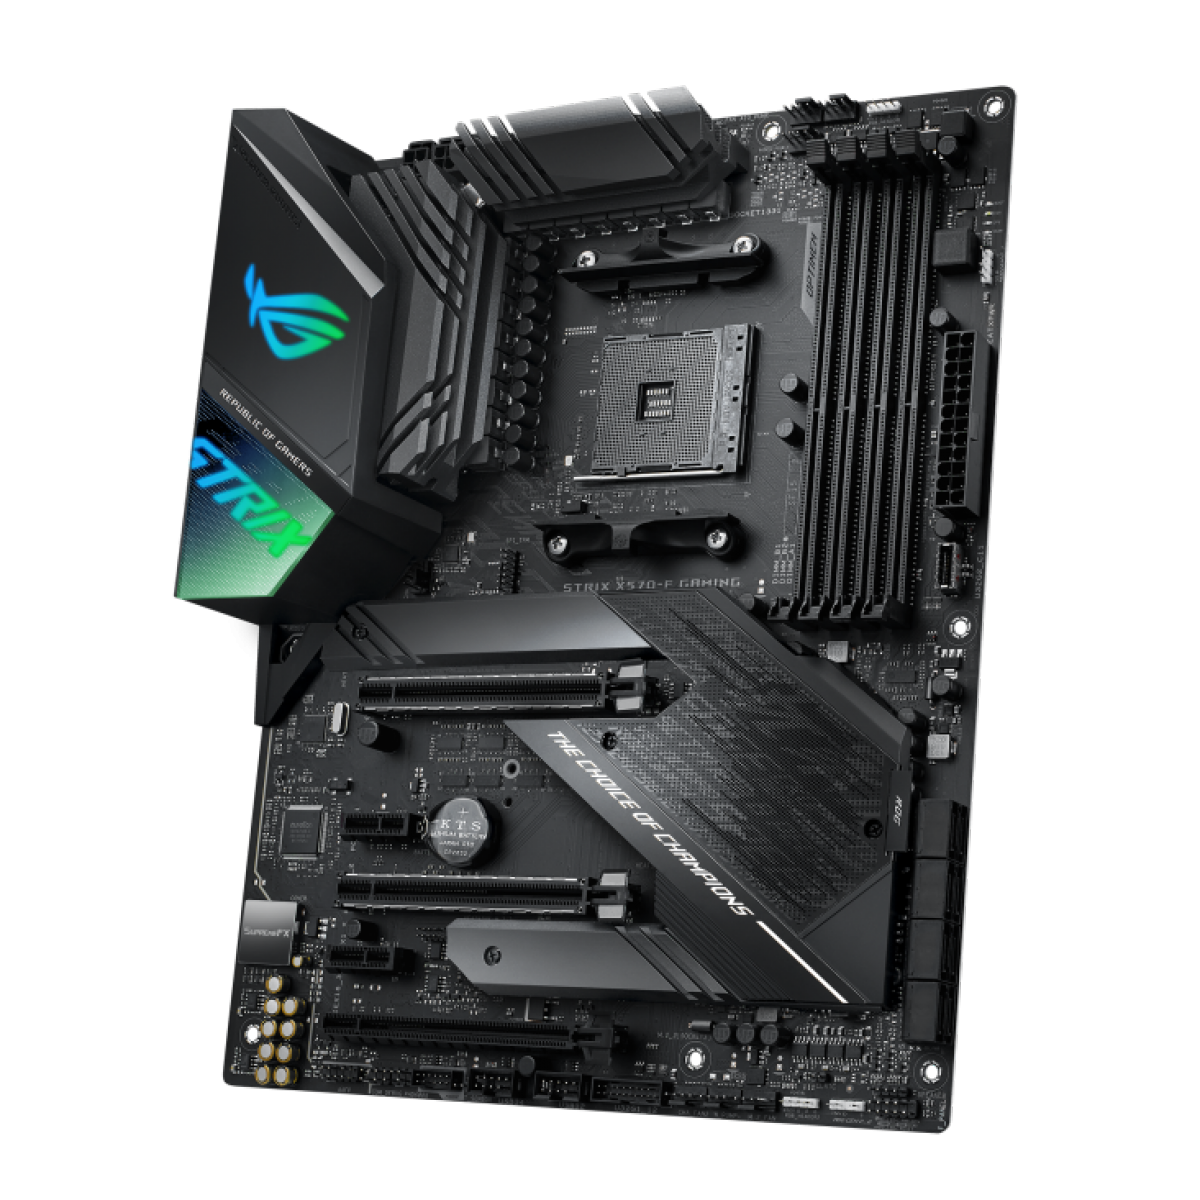 Placa Mãe ASUS ROG STRIX X570-F Gaming, Chipset X570, AMD AM4, ATX, DDR4, 90MB1160-M0EAY0 - IMP